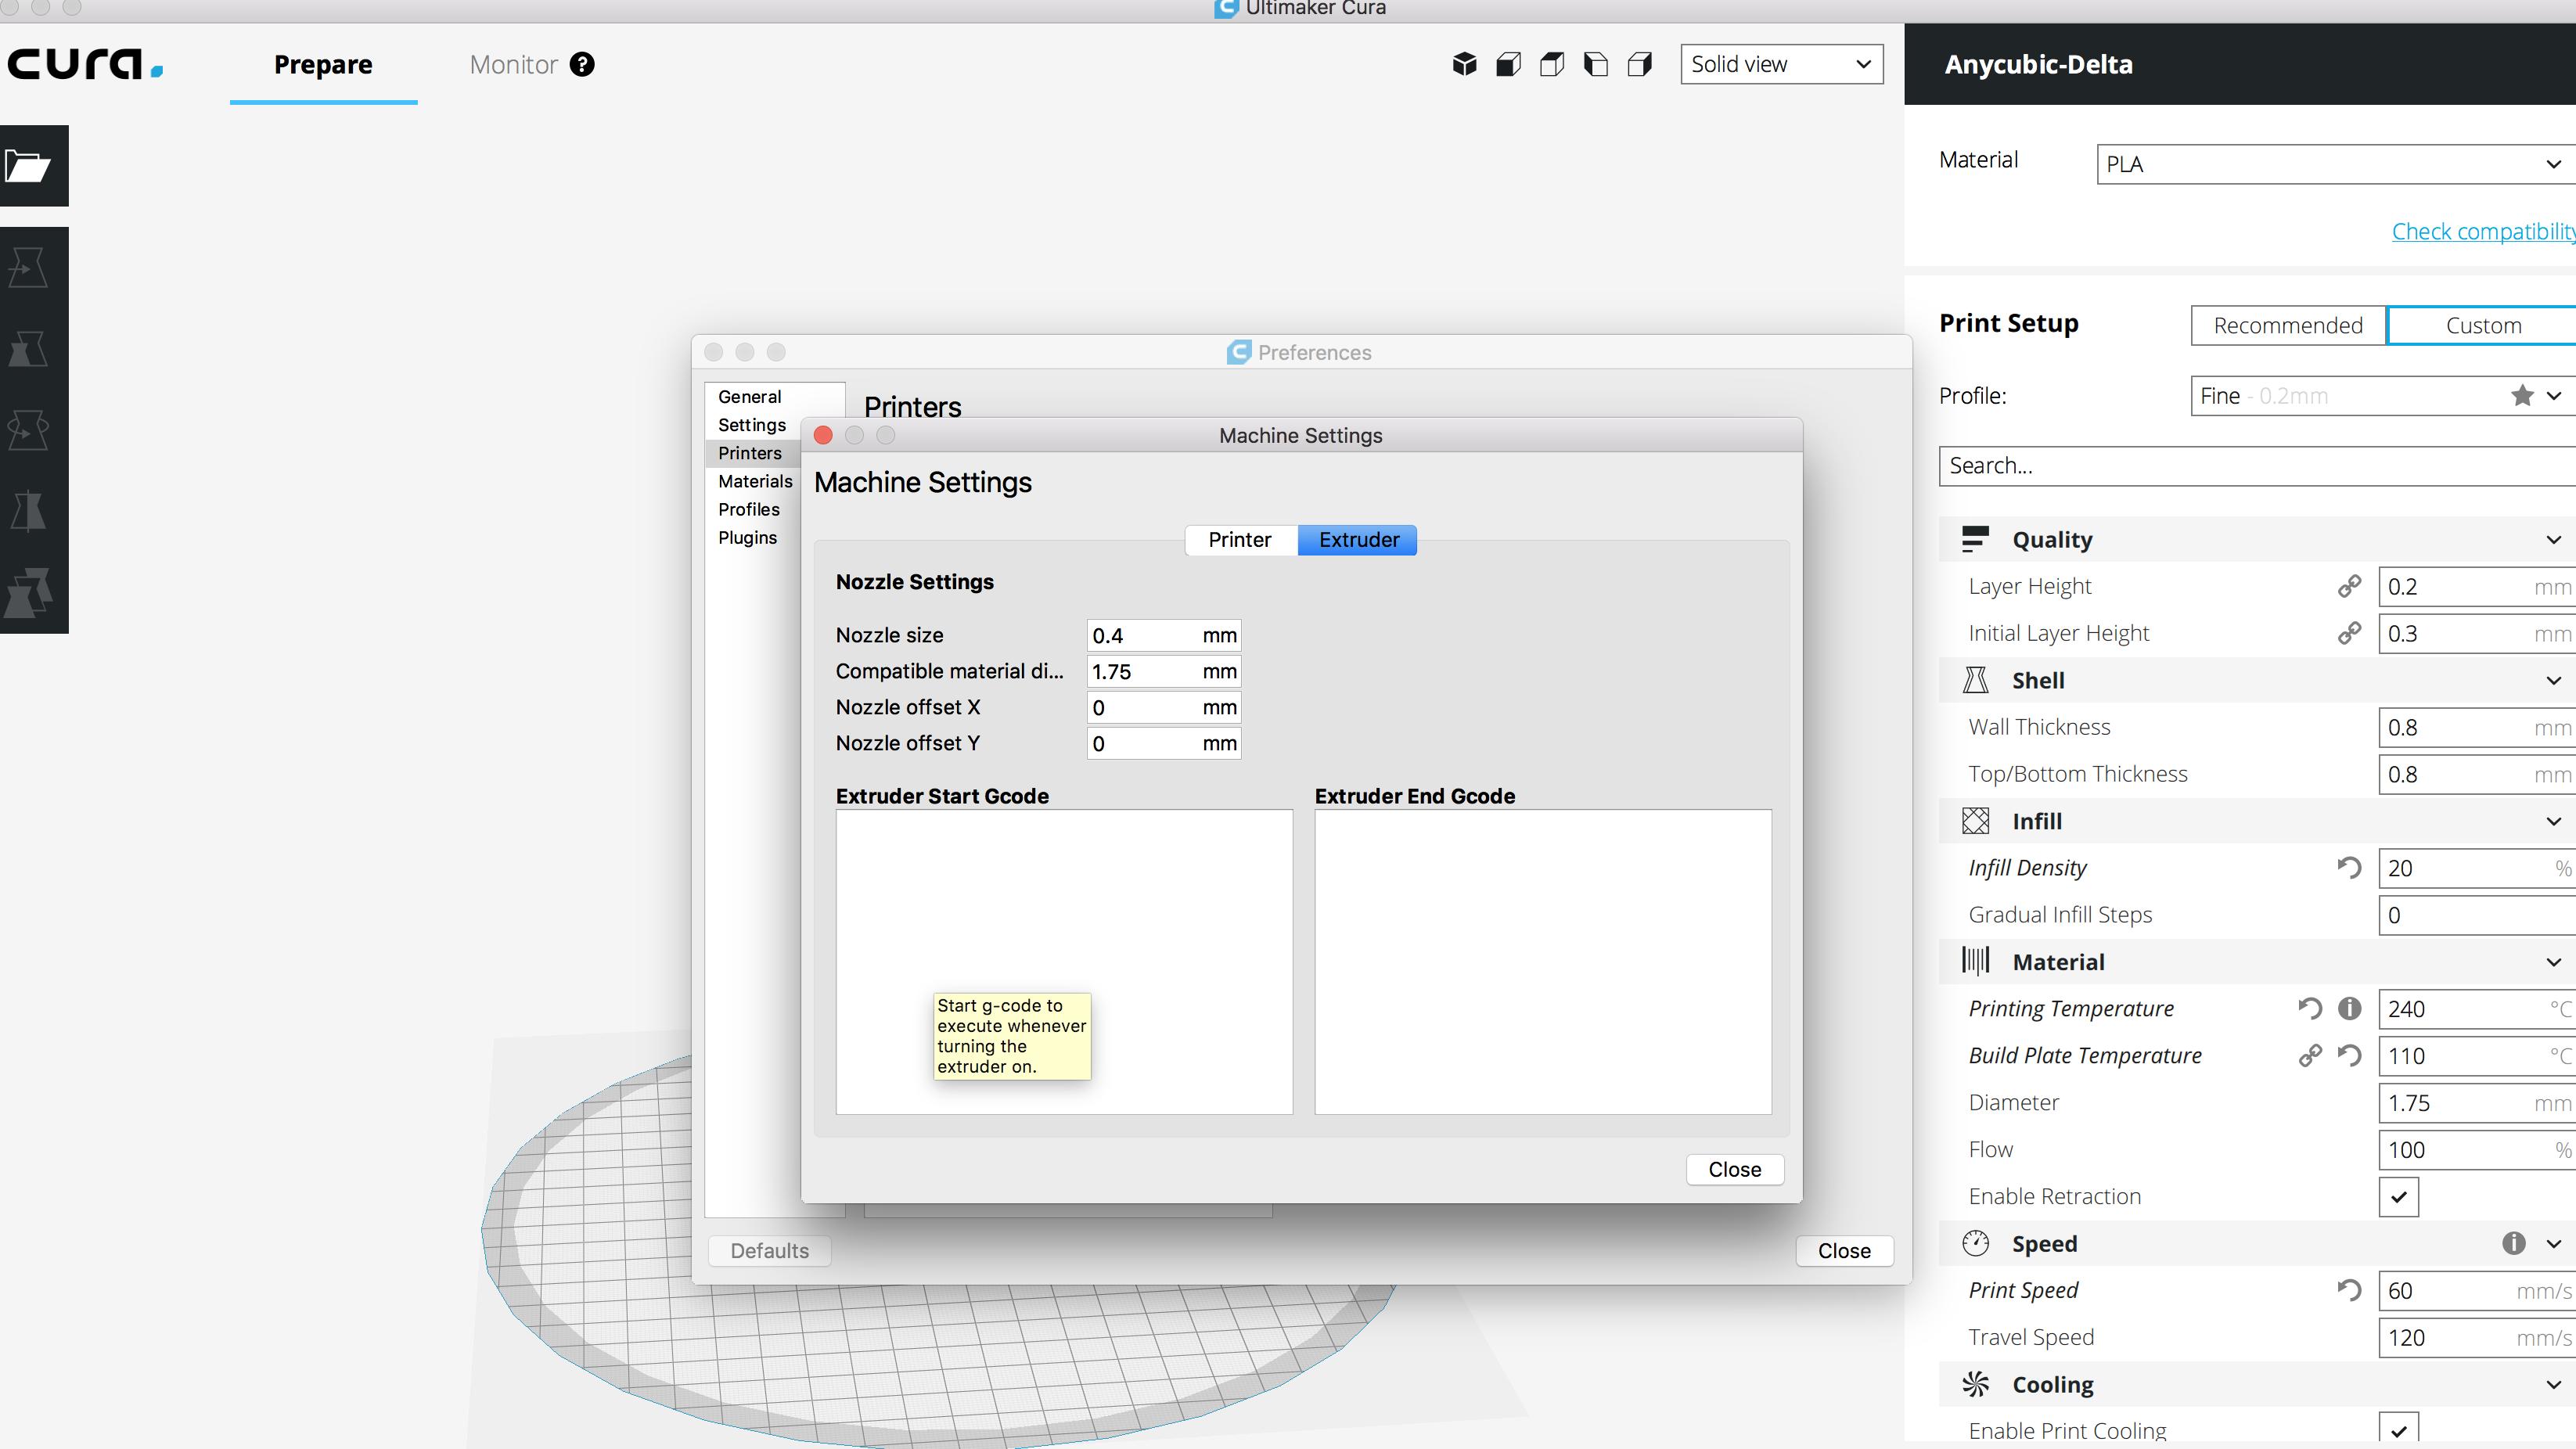 printer setting bug · Issue #3549 · Ultimaker/Cura · GitHub